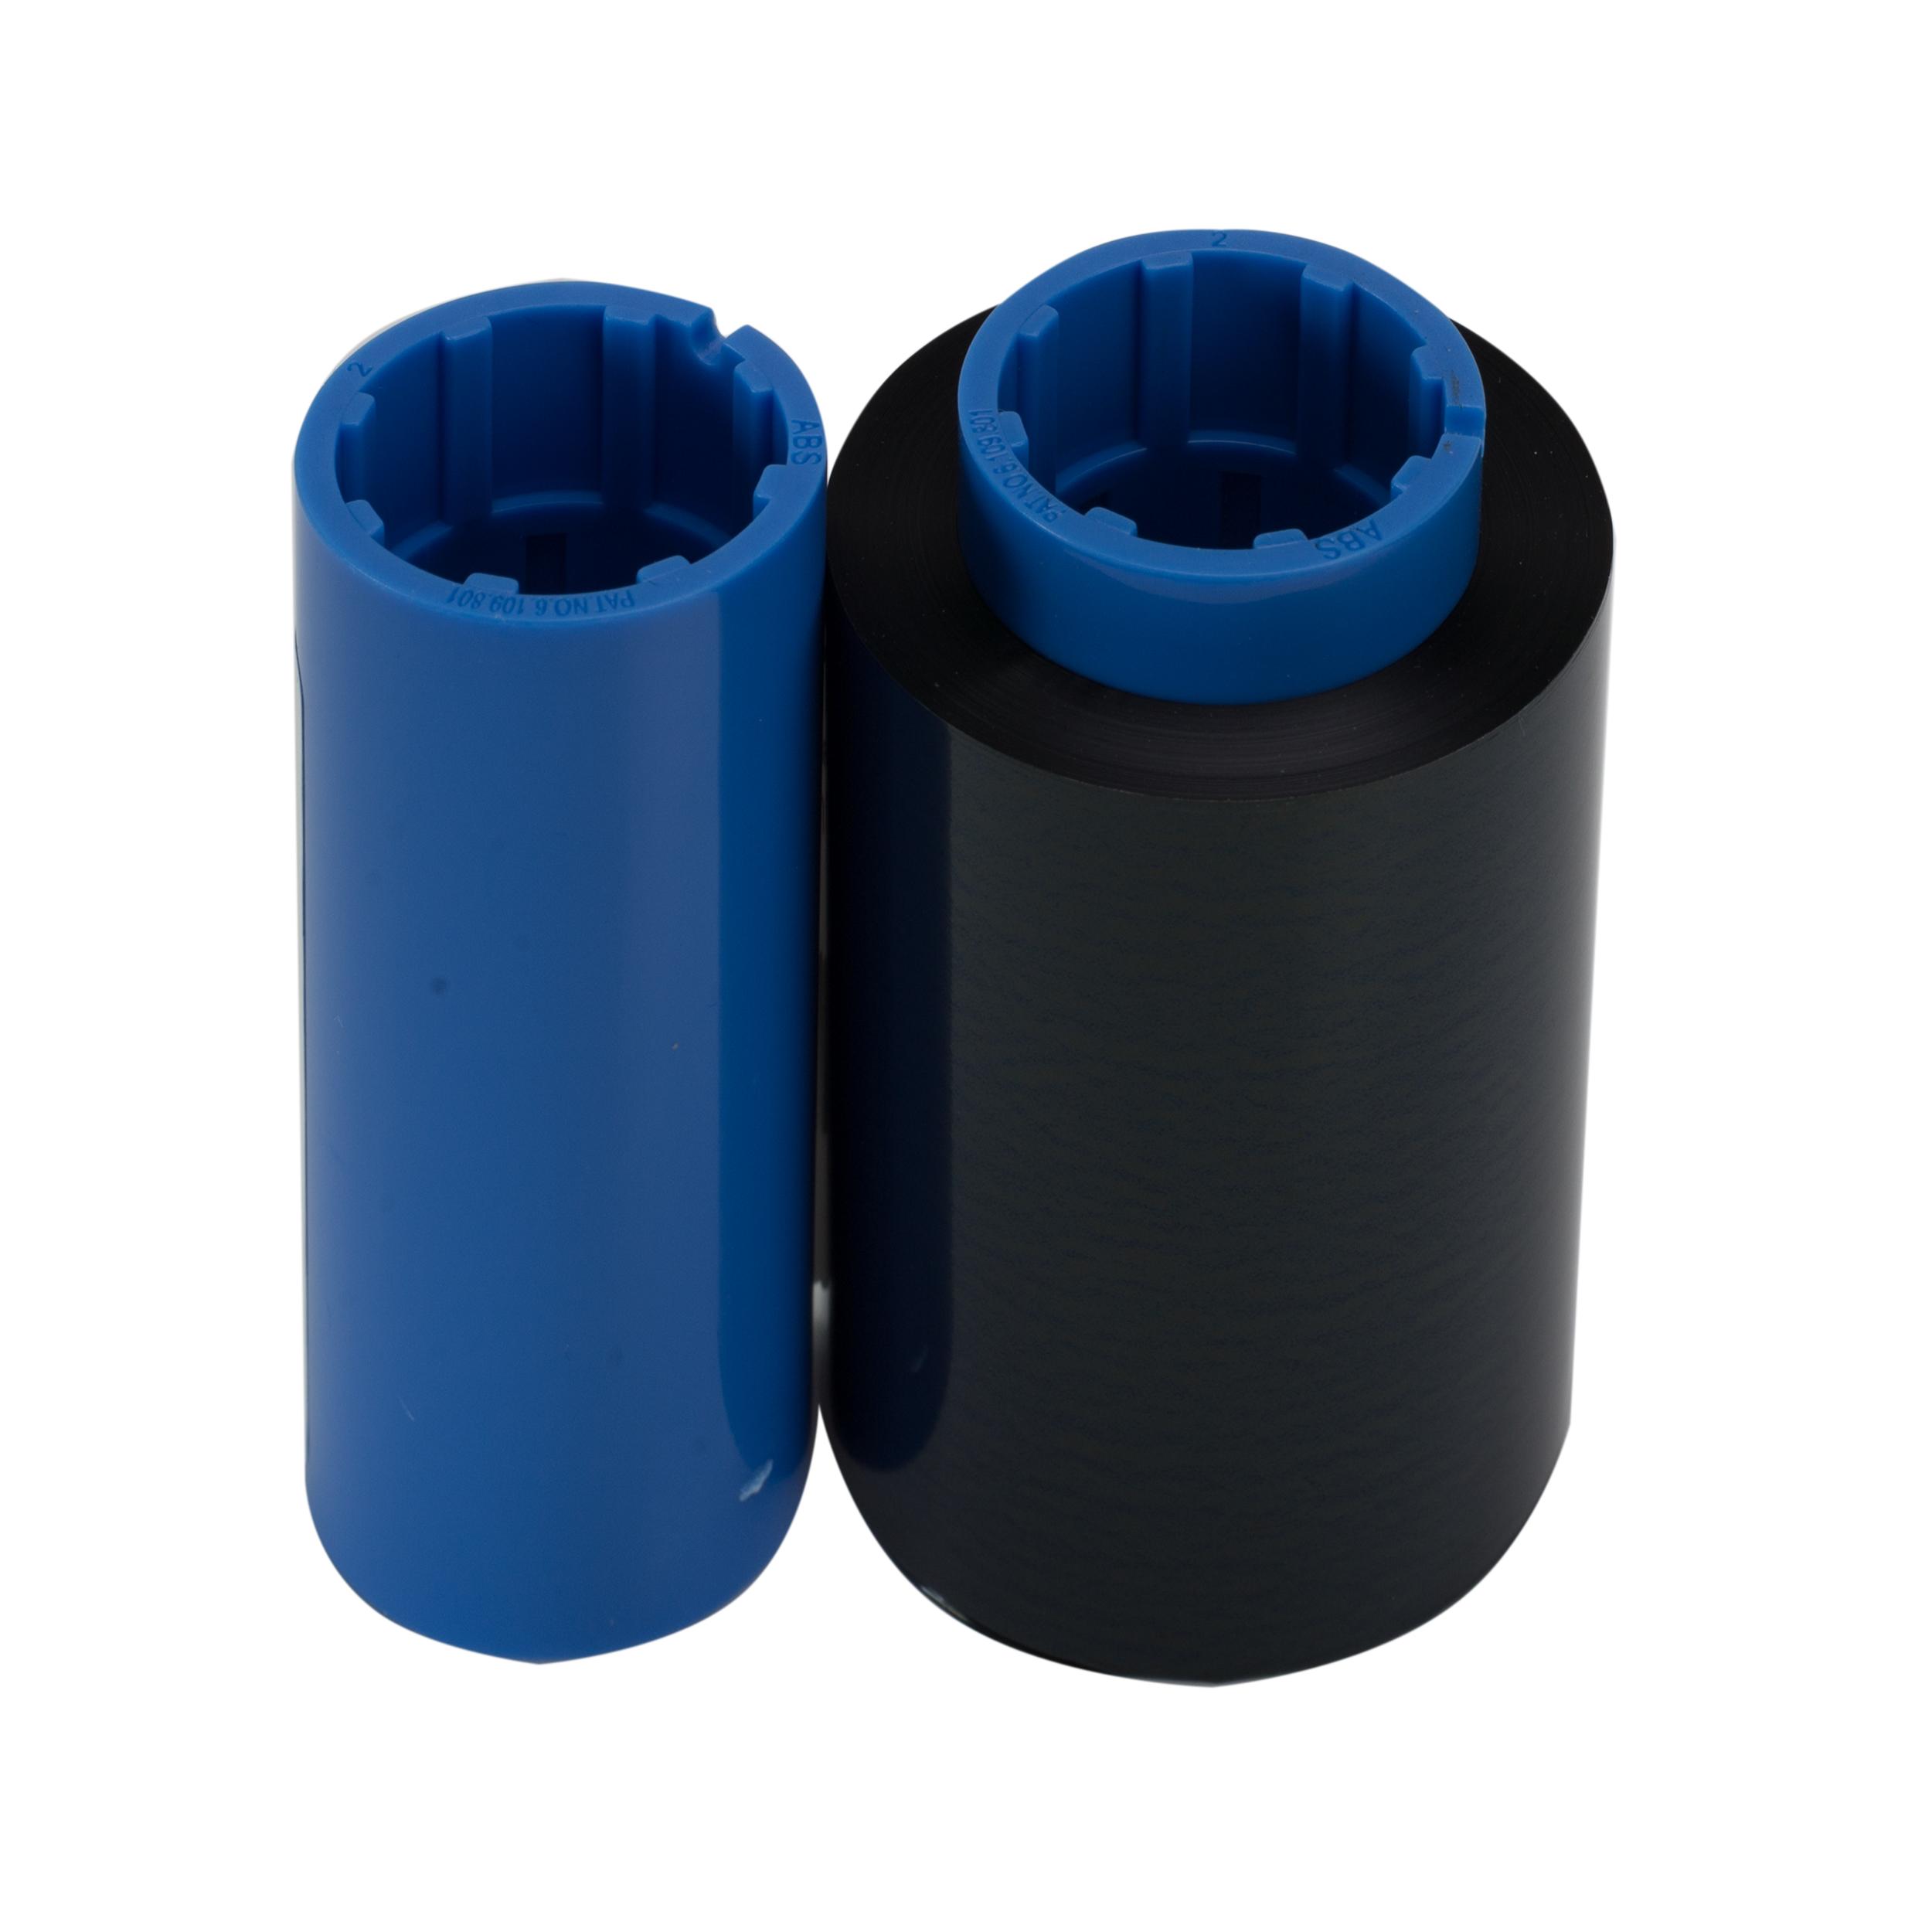 Чорна стрічка сумісна з принтером Zebra 800015-101 BLACK Compatible ribbon